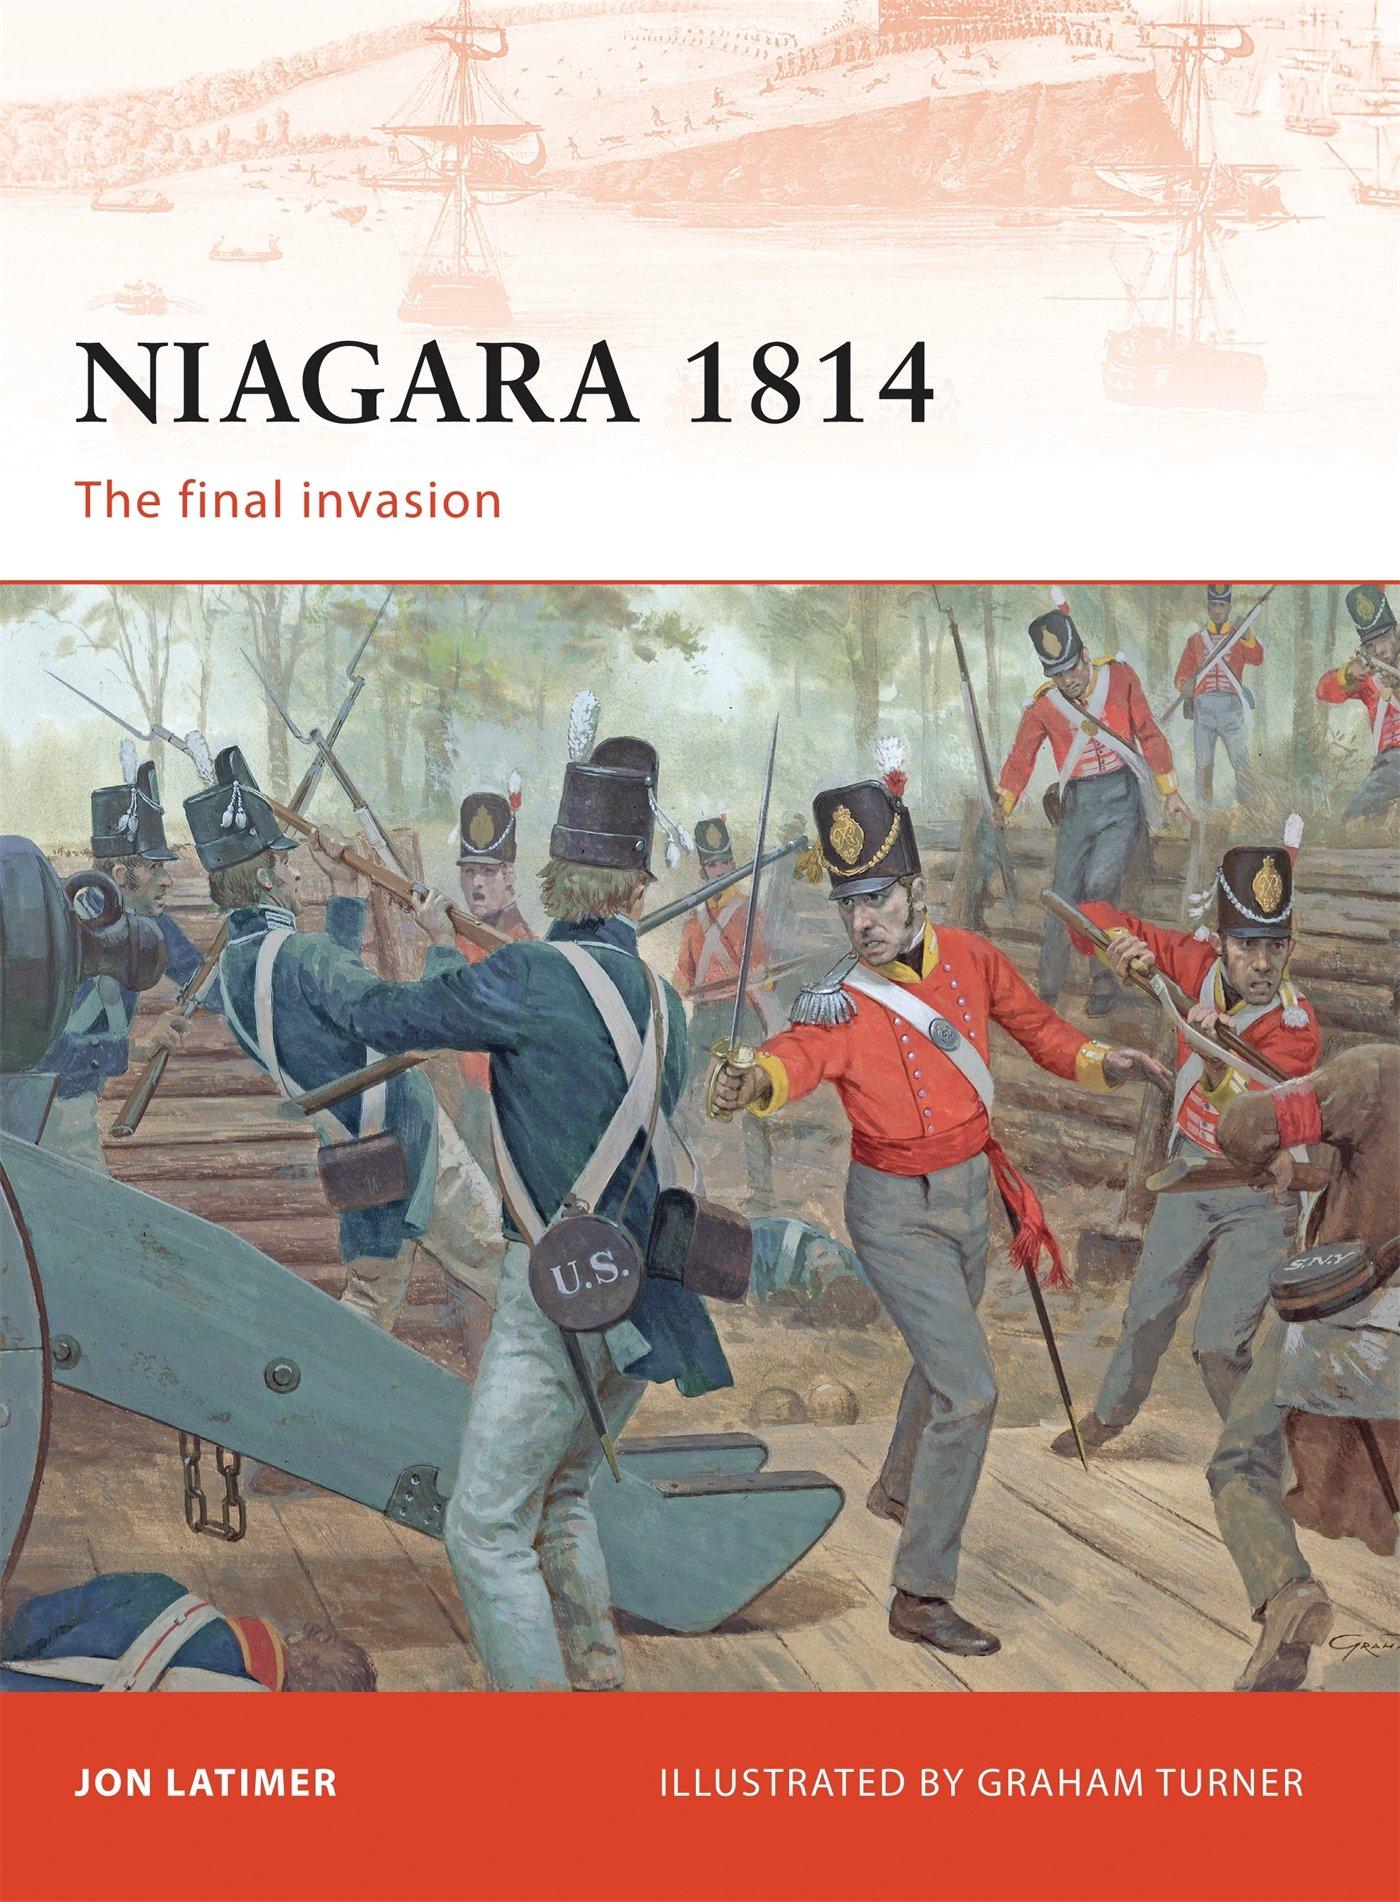 Niagara 1814: The final invasion (Campaign): Jon Latimer, Graham Turner:  9781846034398: Amazon.com: Books